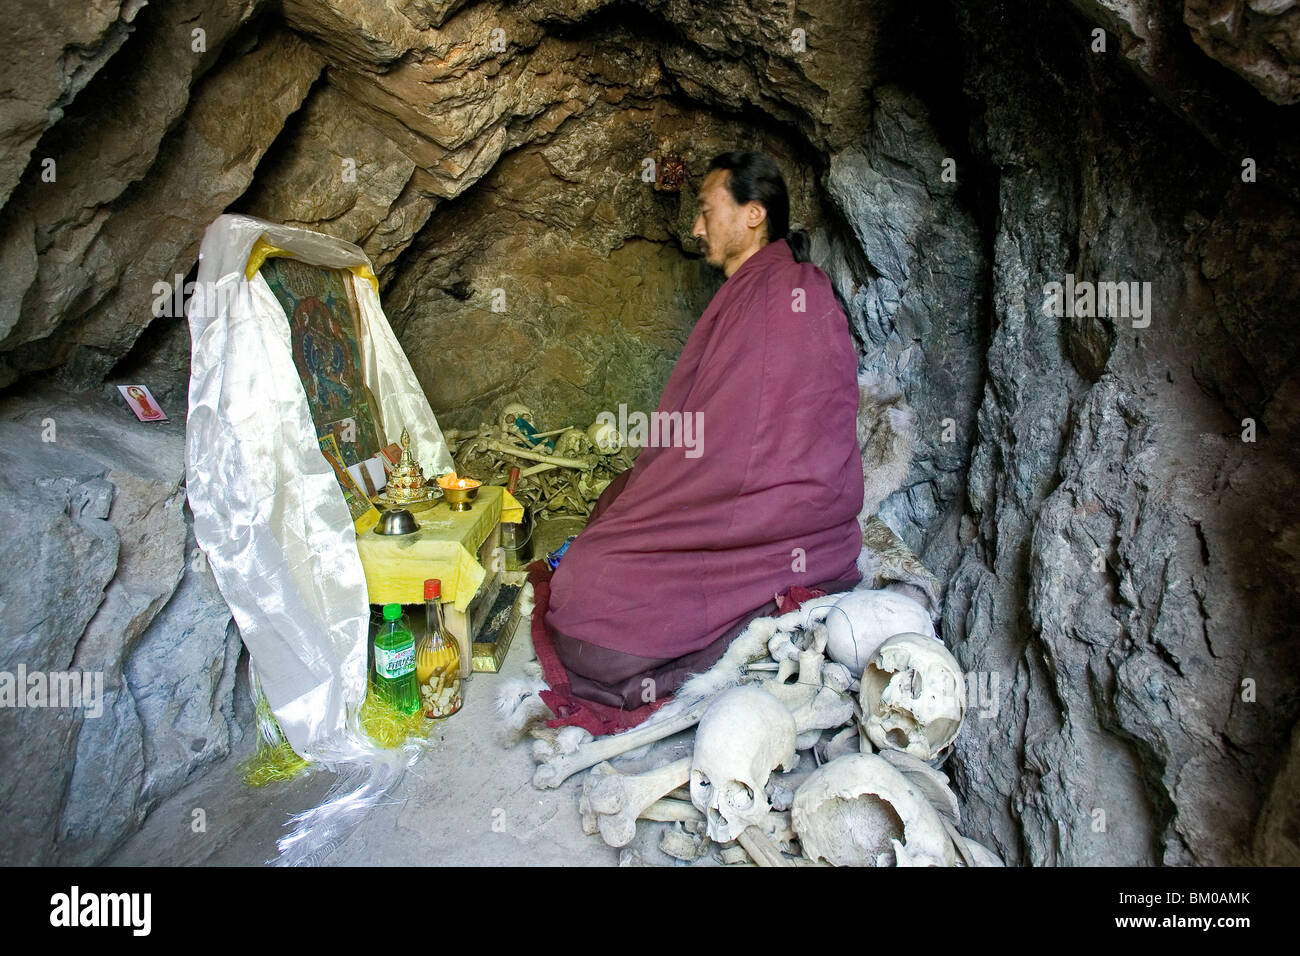 Mountain Hermit's Secret Wisdom | Indiegogo